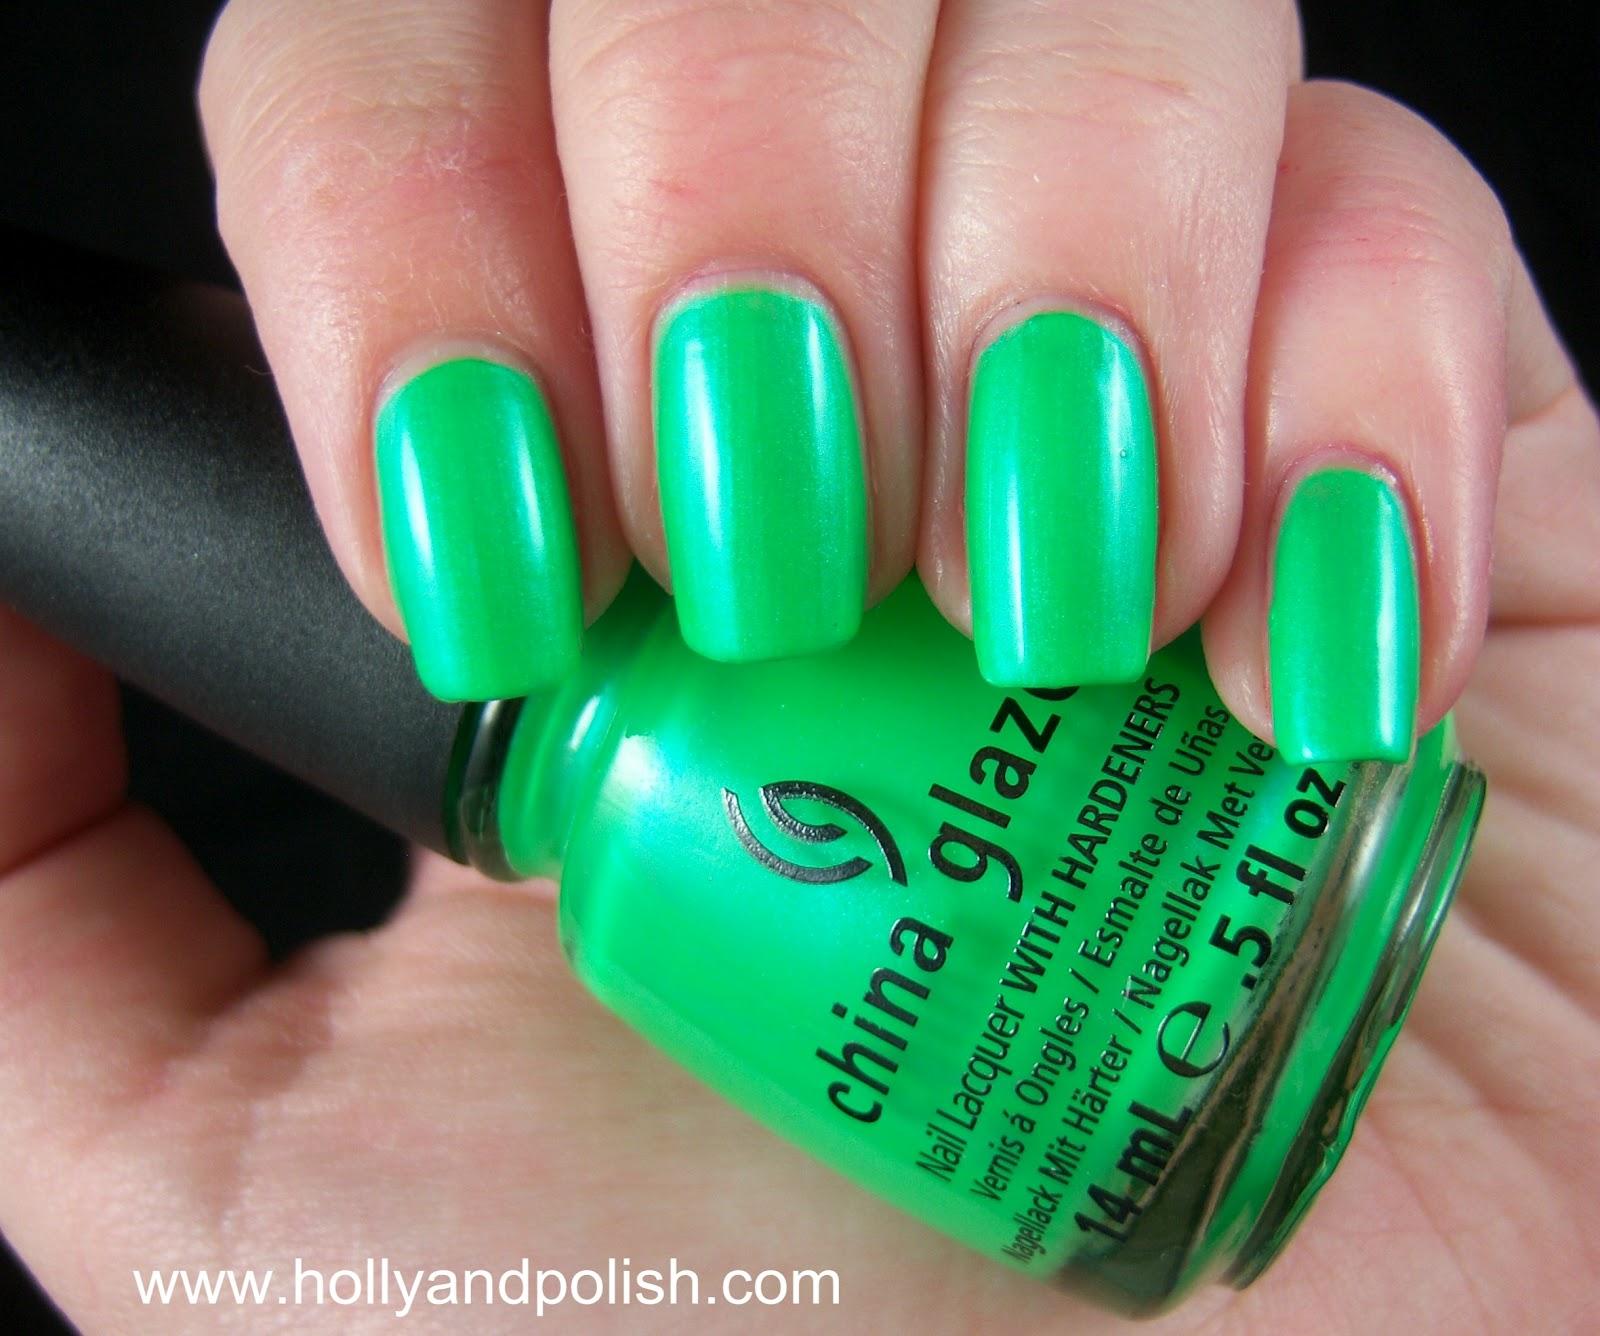 Holly and Polish: A Nail Polish and Beauty Blog: China Glaze In The ...